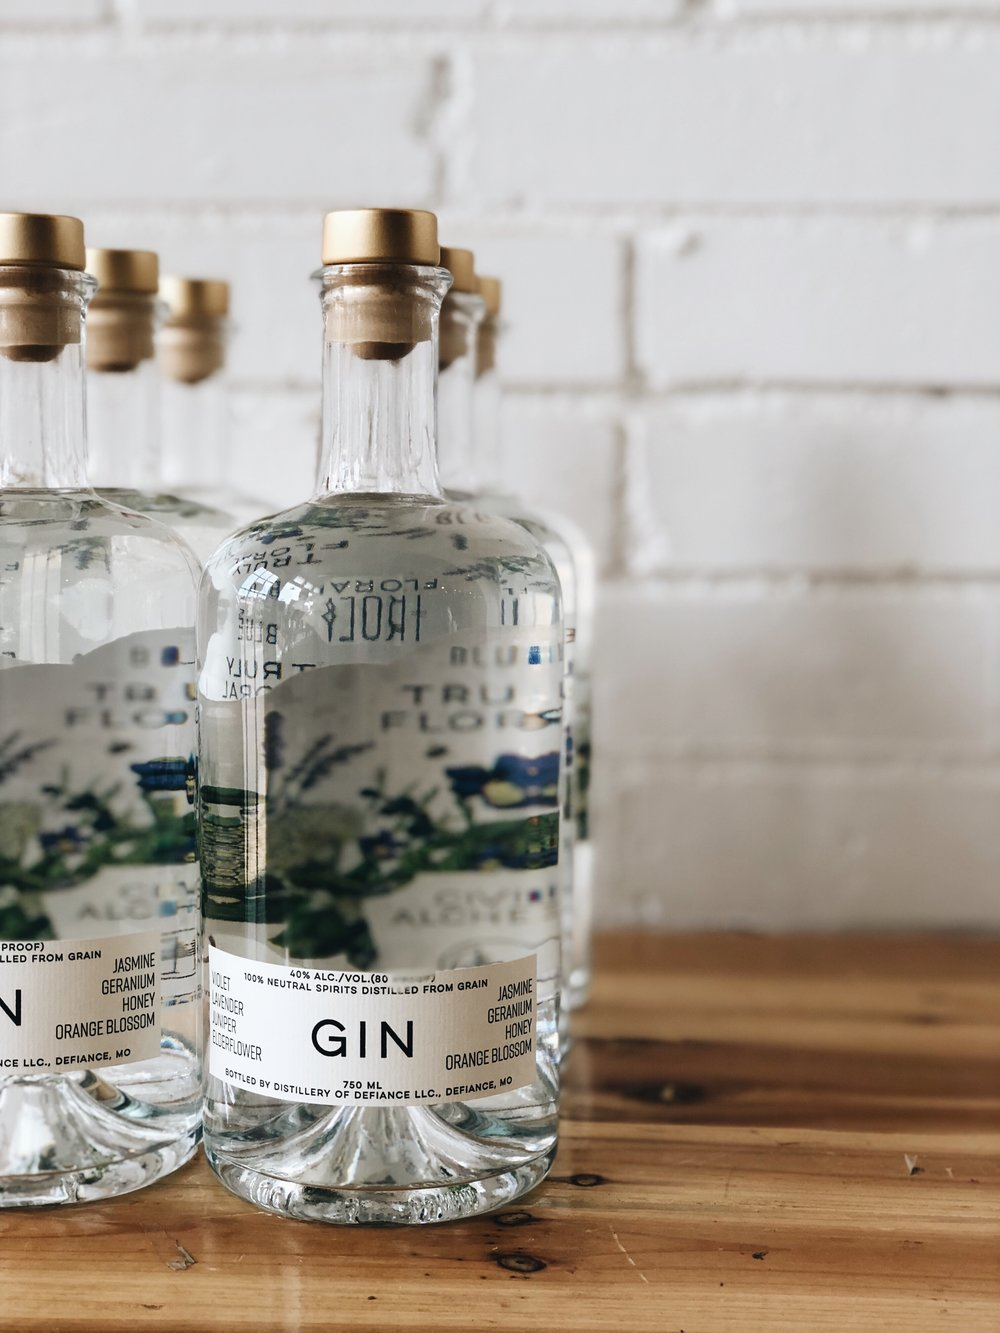 Gin especially crafted for Civil Alchemy with flavors of violet, lavender, juniper, elderflower, jasmine, geranium, honey, and orange blossom.